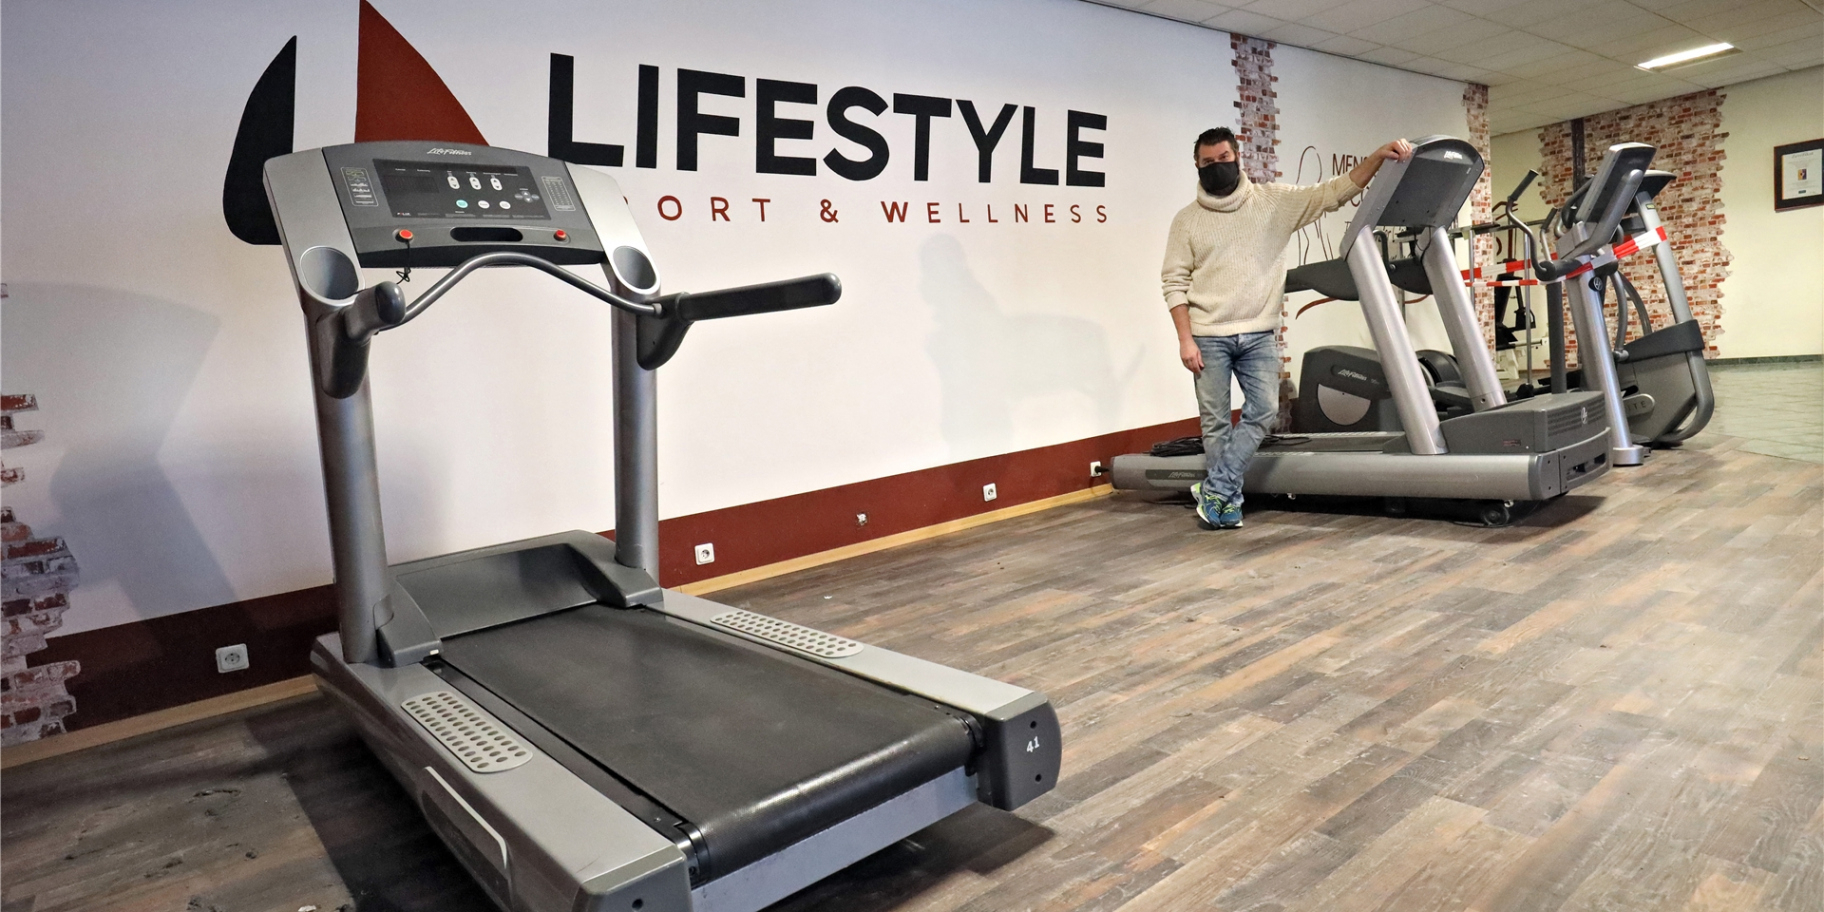 Beispiel Kündigung Fitnessstudio Wegen Corona Vorlage  Bearbeitbar